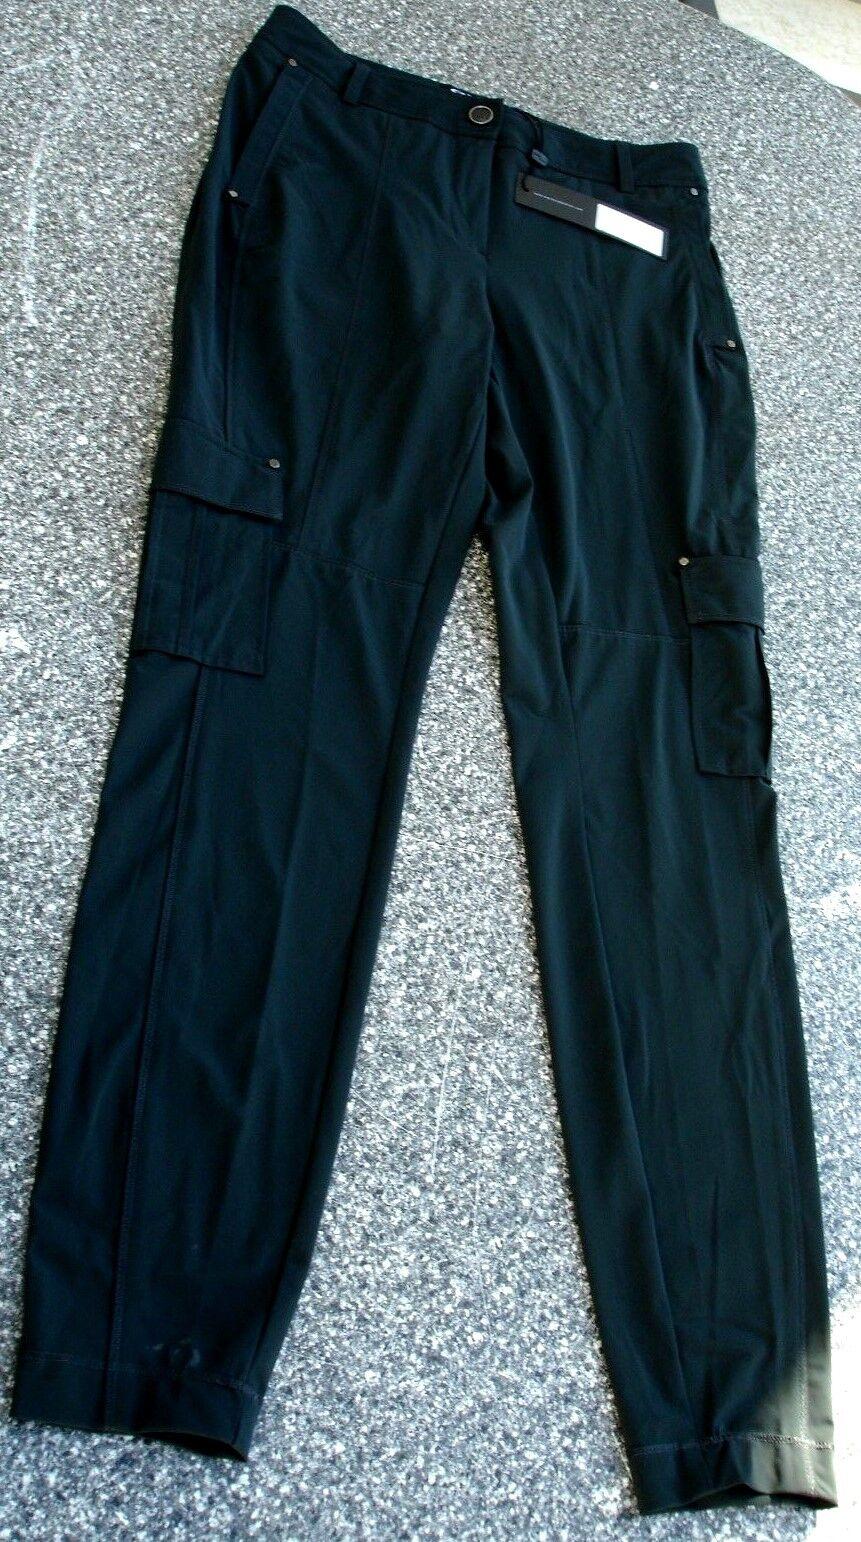 Exklusive Expresso Hose 34 black Bundweite76cm v Trendhaus Woman Np,119,95-